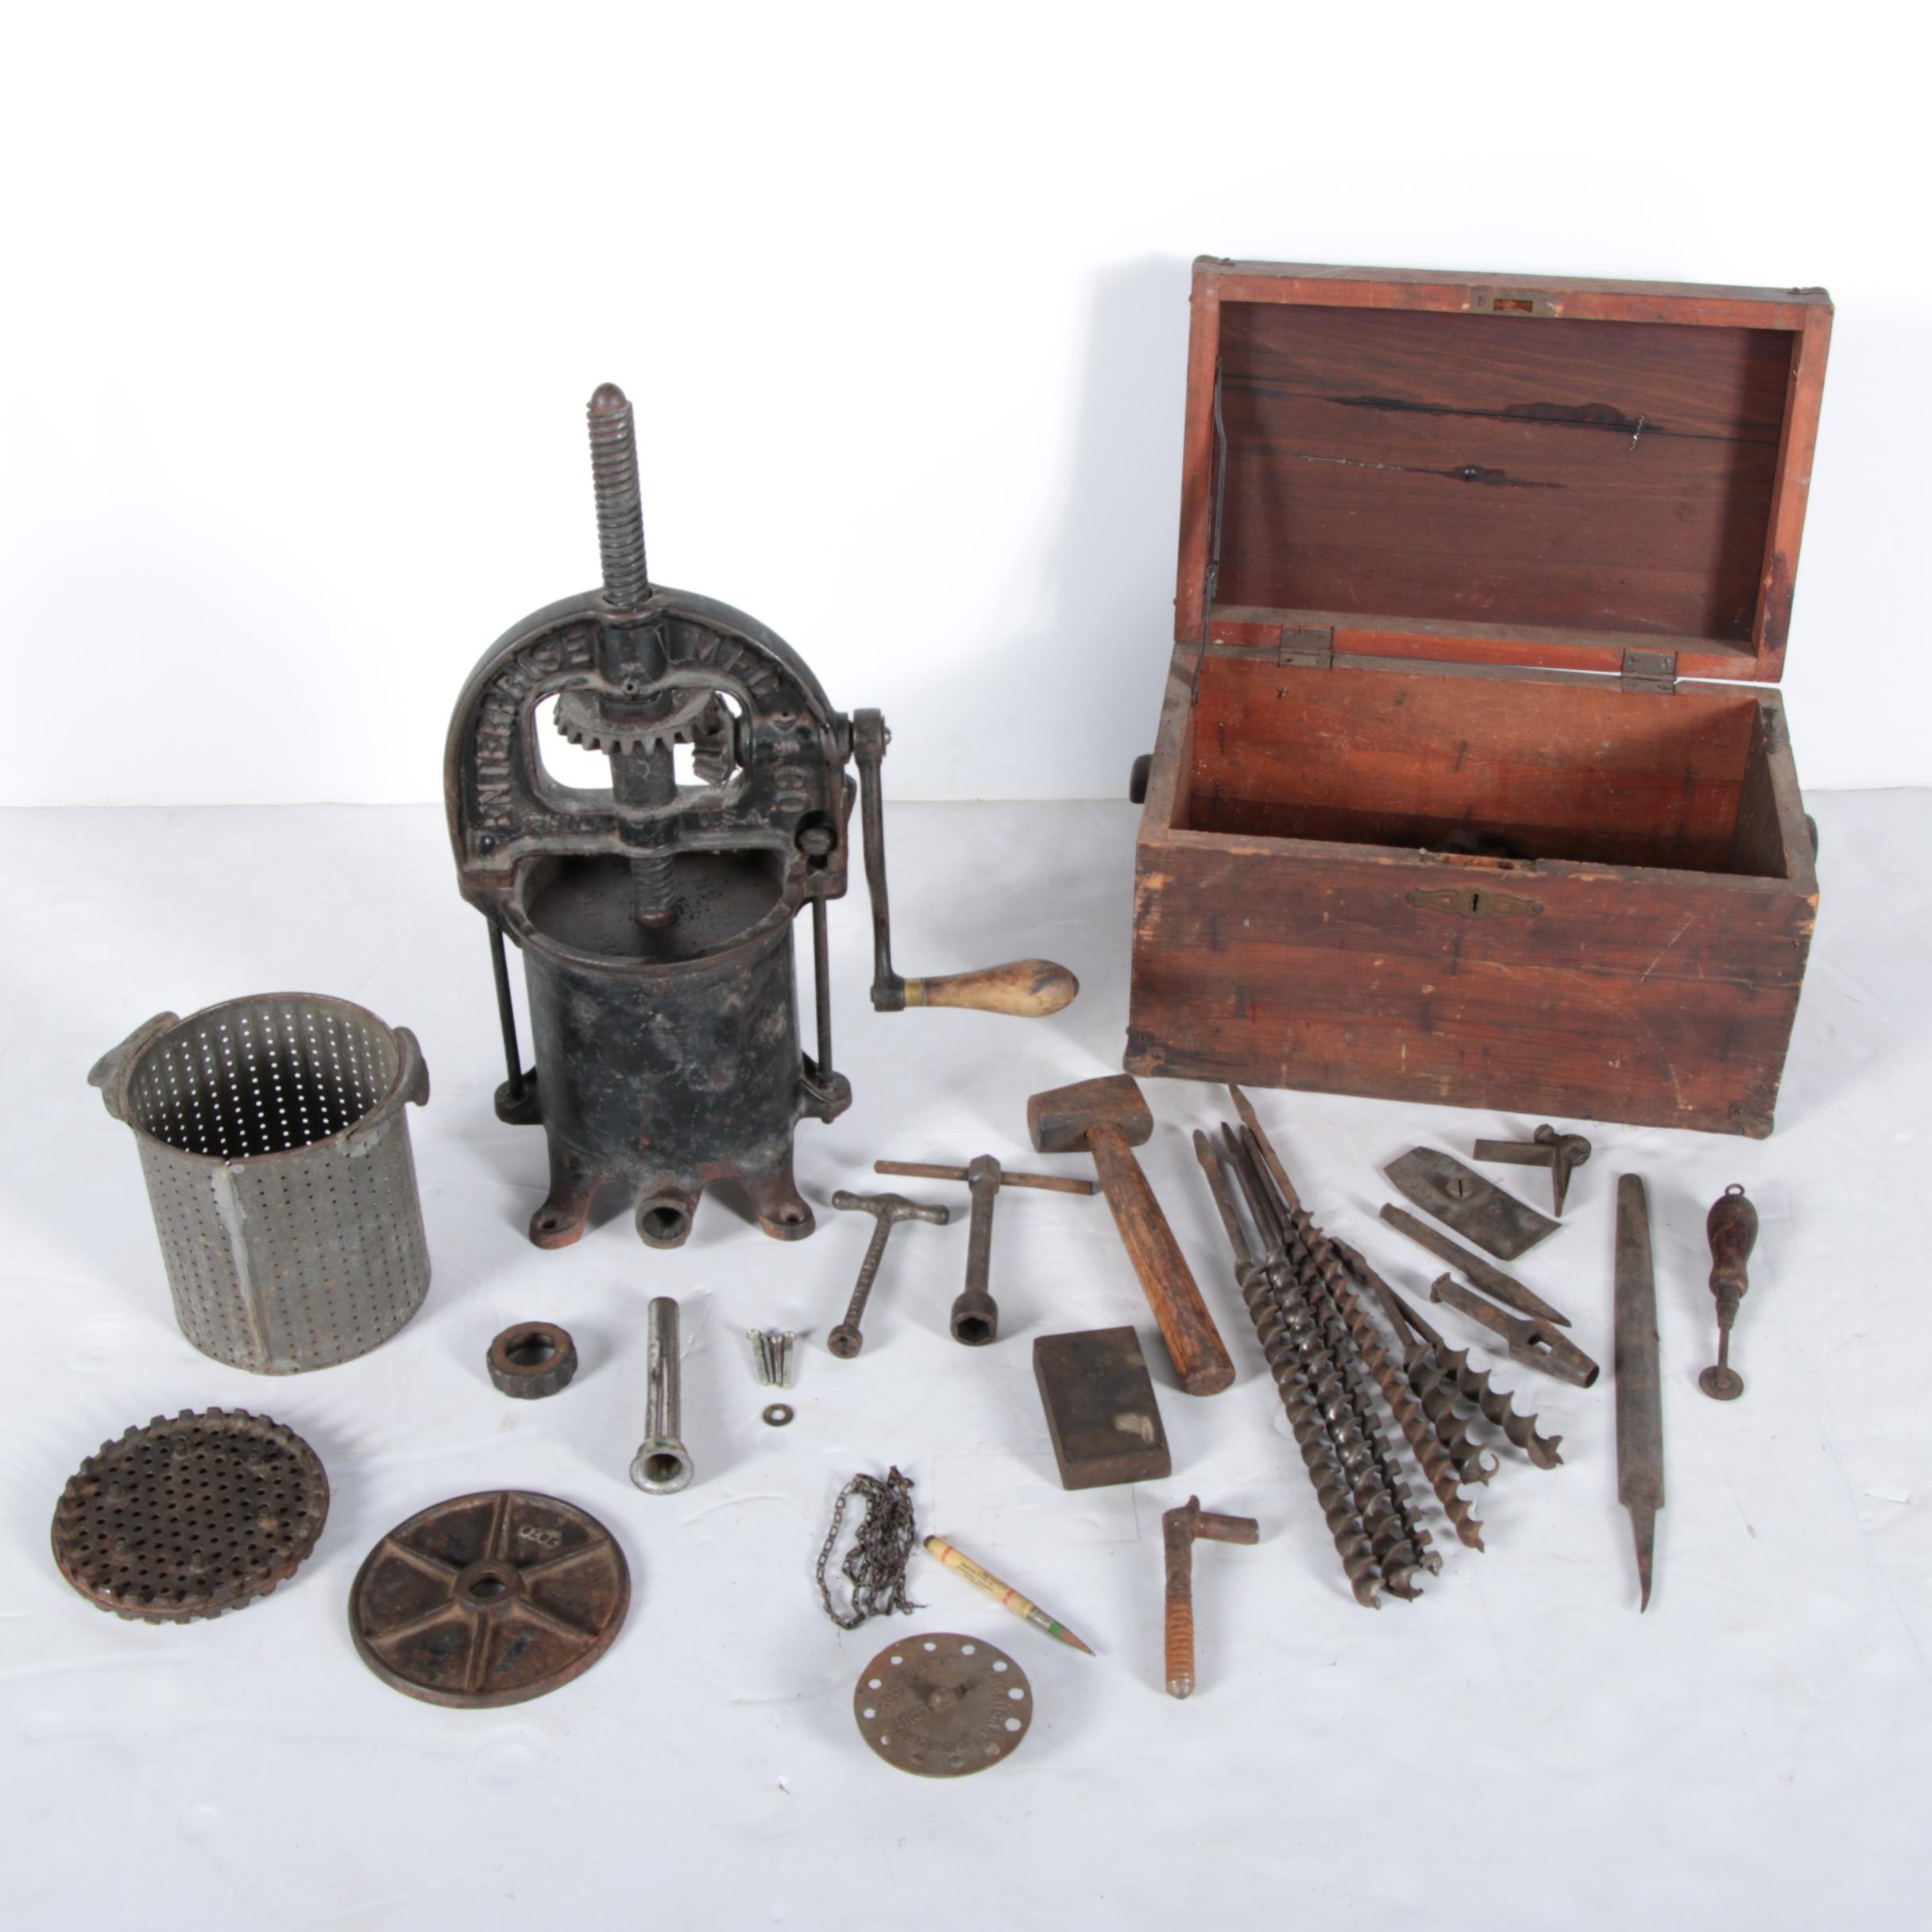 Vintage Enterprise Mfg Co. Press and Tools